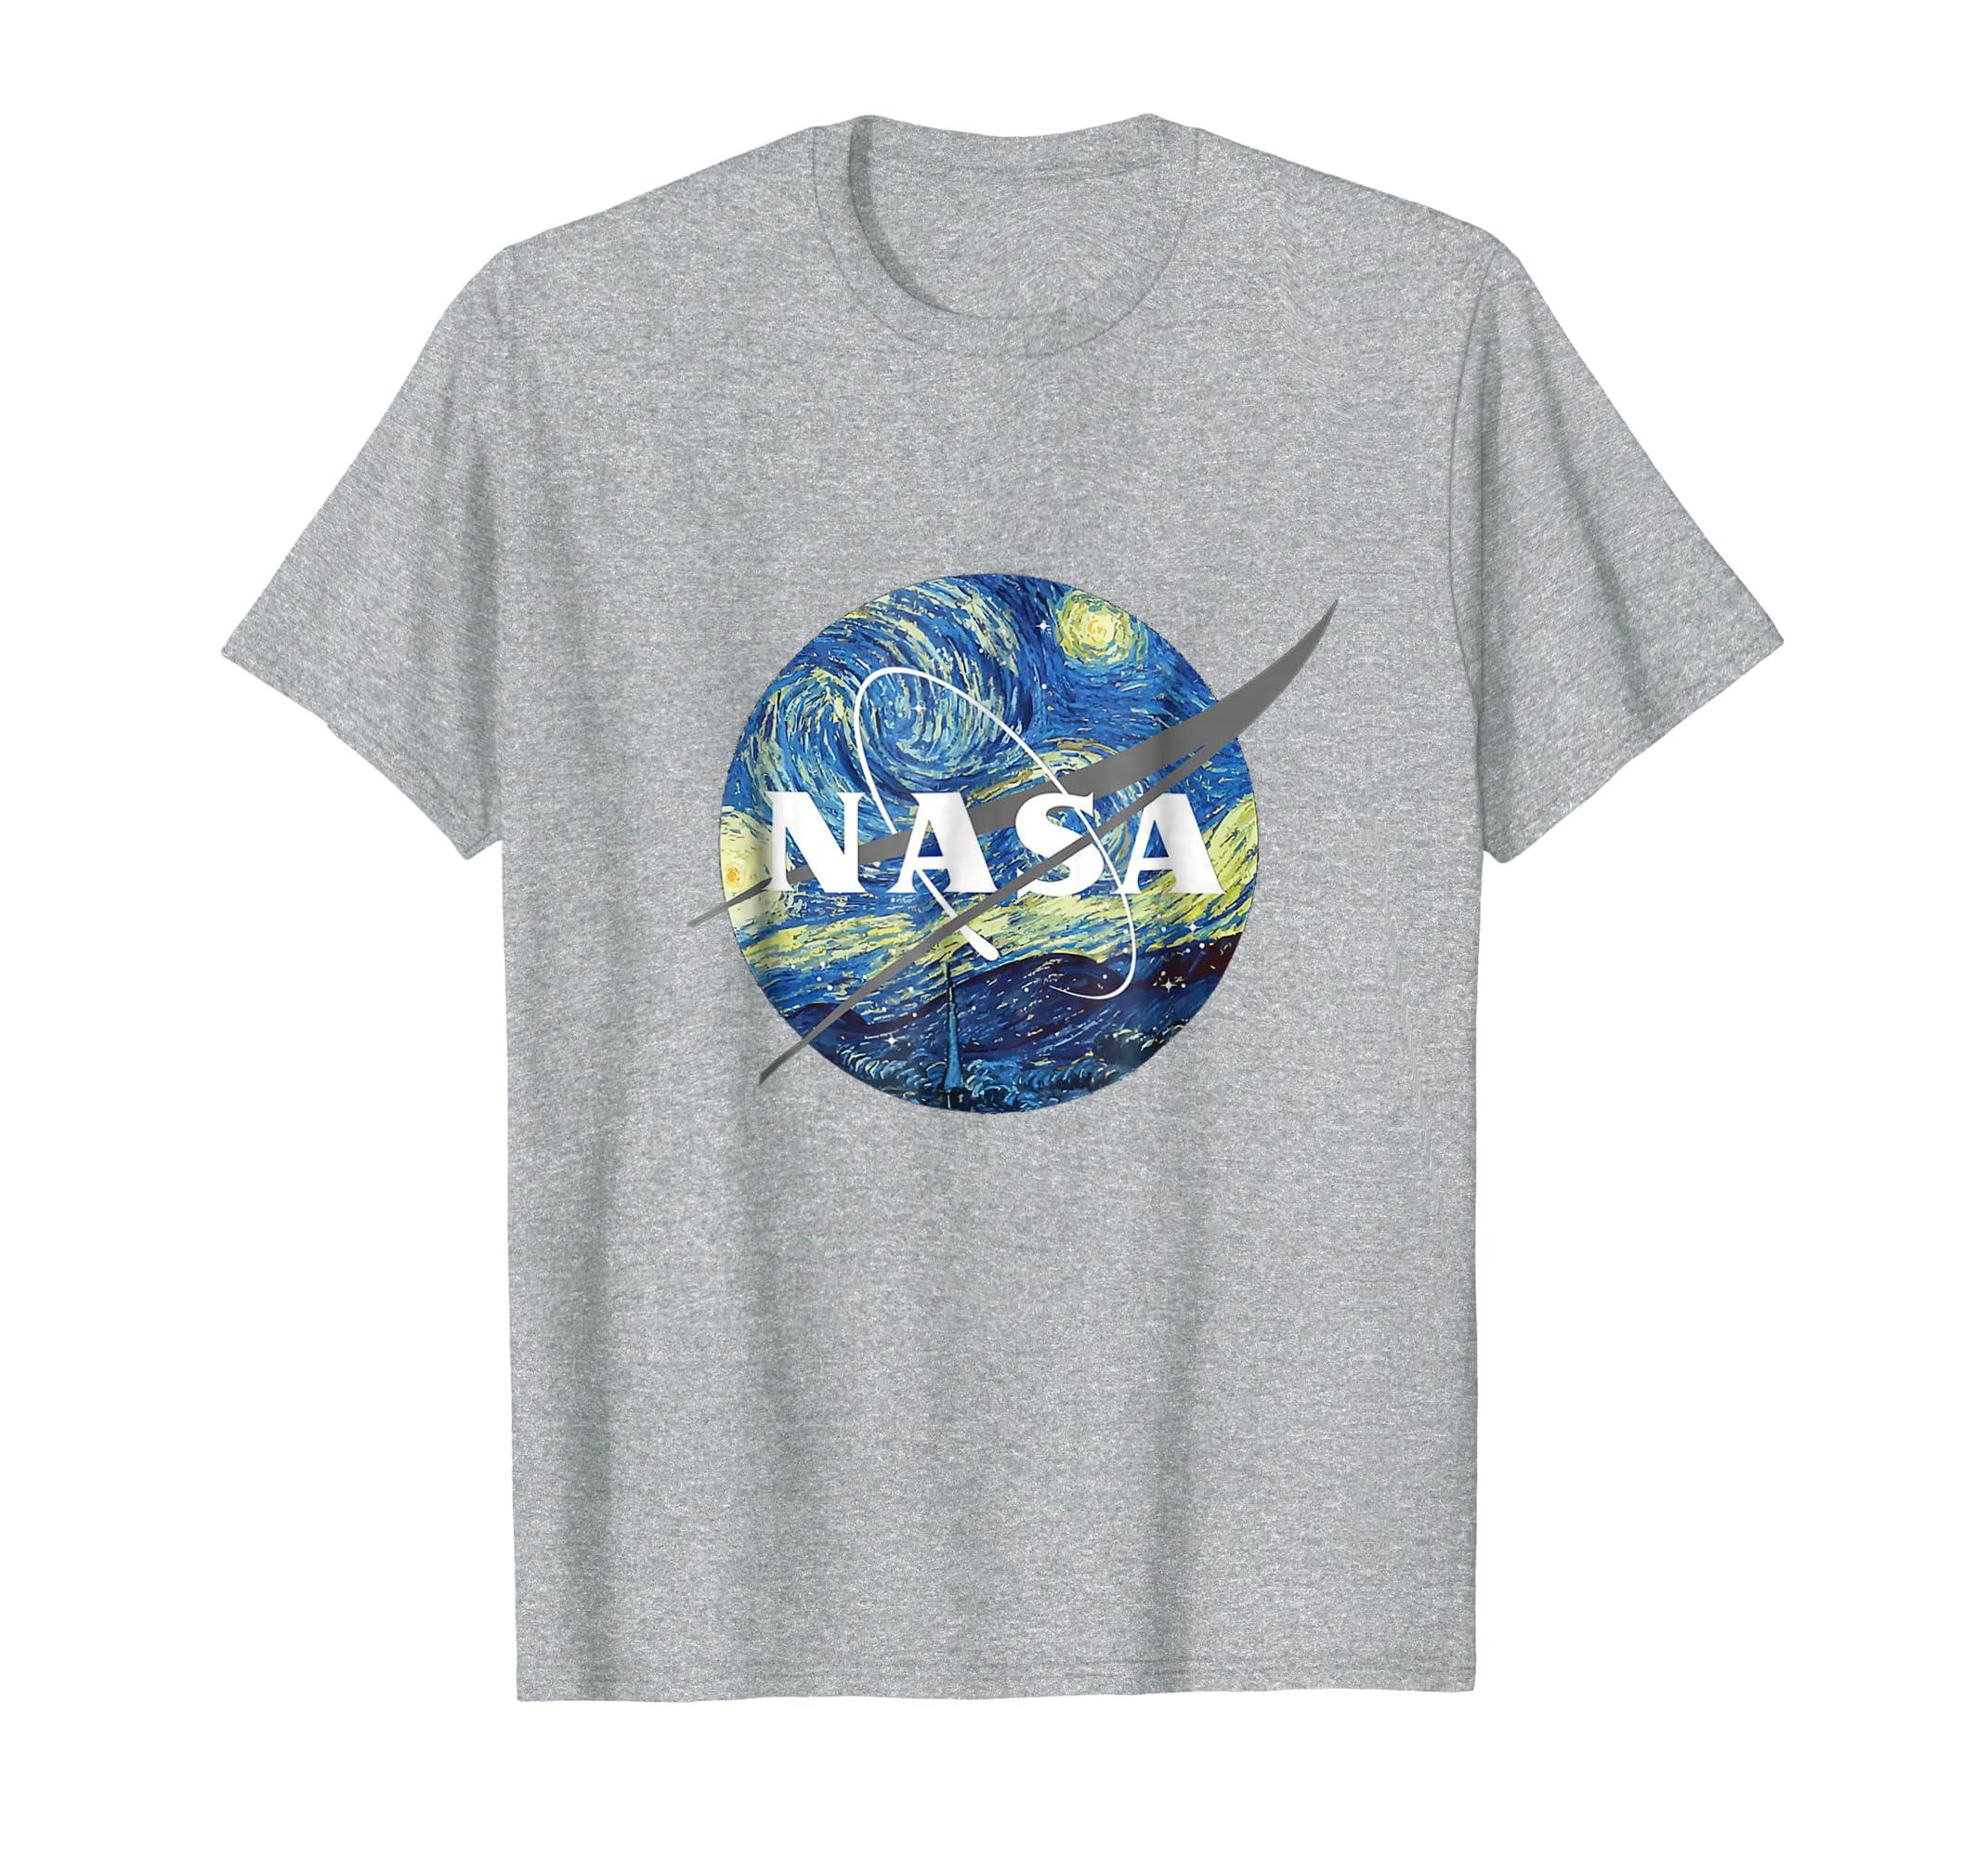 Amazon.com: Nasa Starry Night T-Shirt - Nasa Van Gogh Style Shirt: Clothing